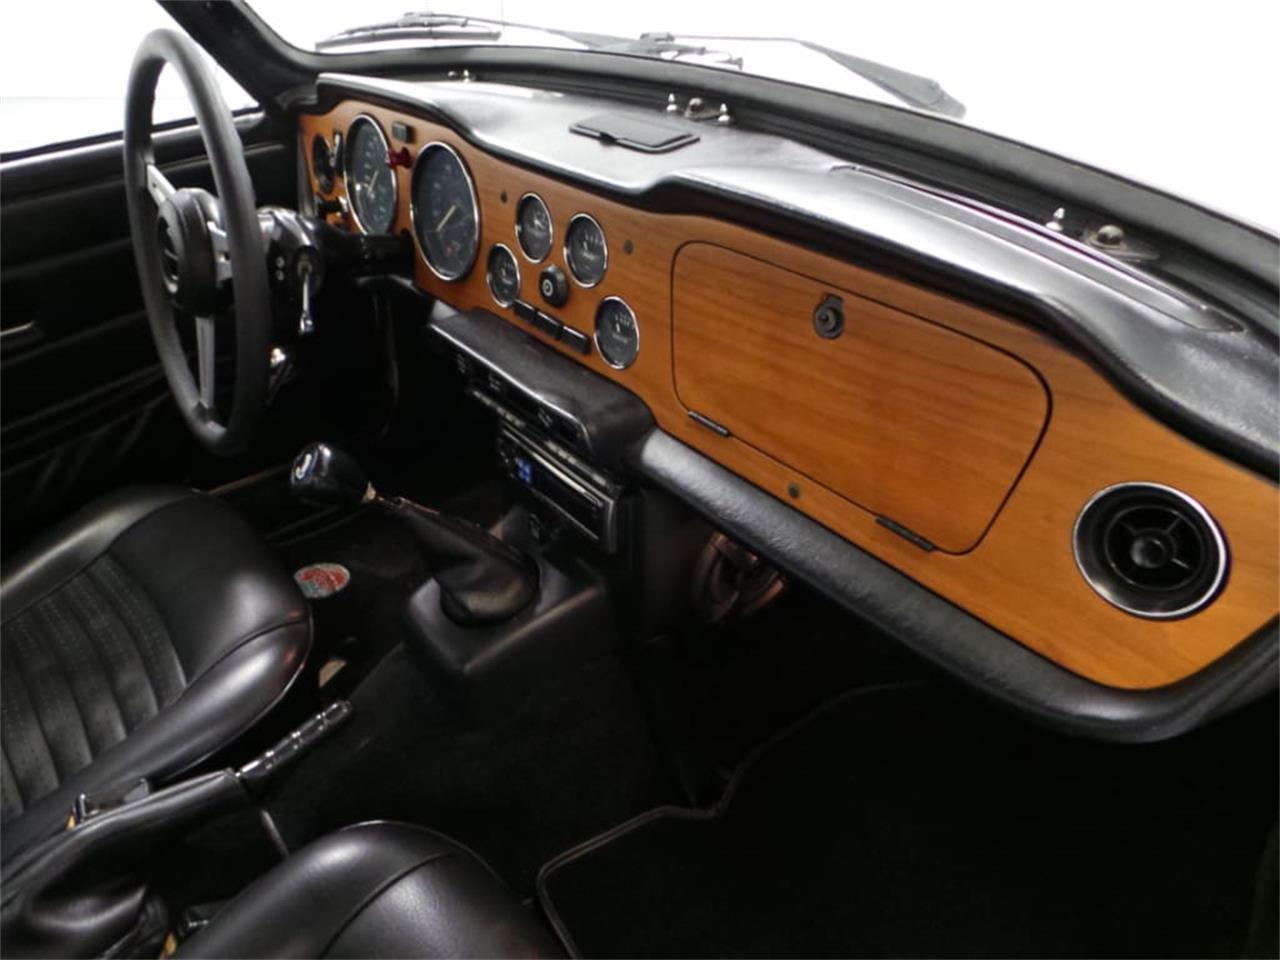 1976 Triumph TR6 (CC-1337538) for sale in Christiansburg, Virginia